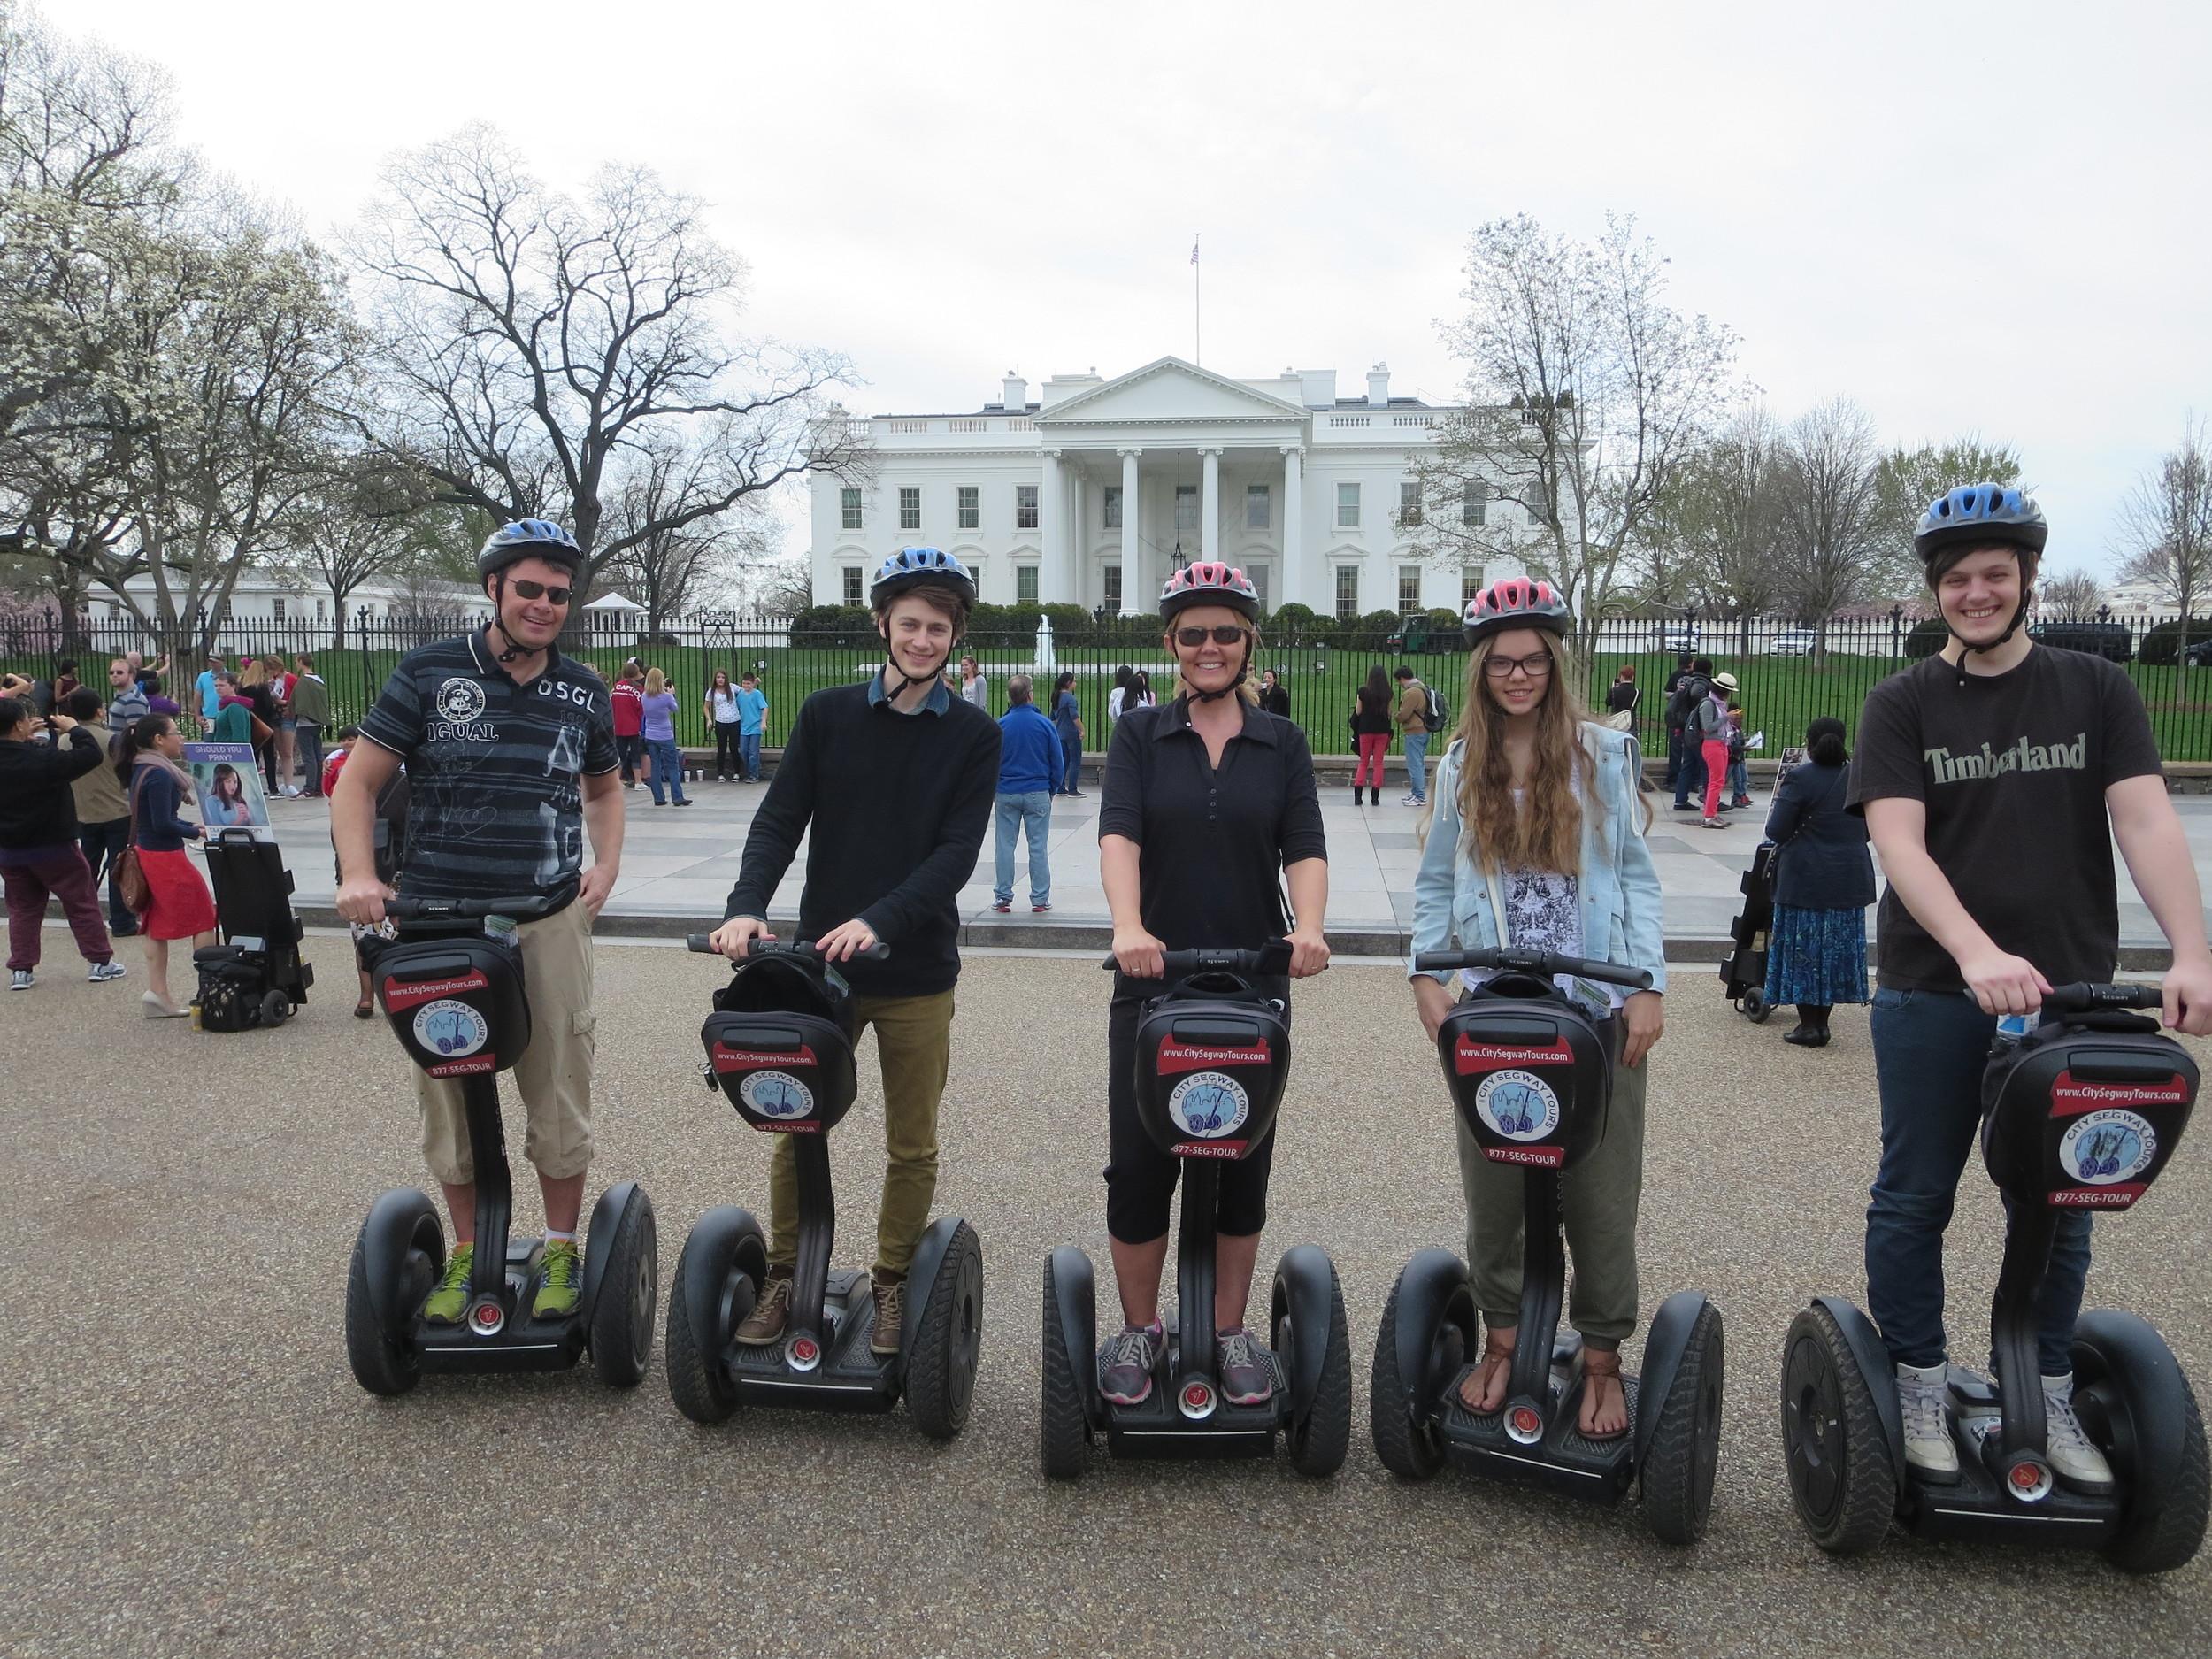 When the boys came we did a fun Segway tour through the Washington Mall